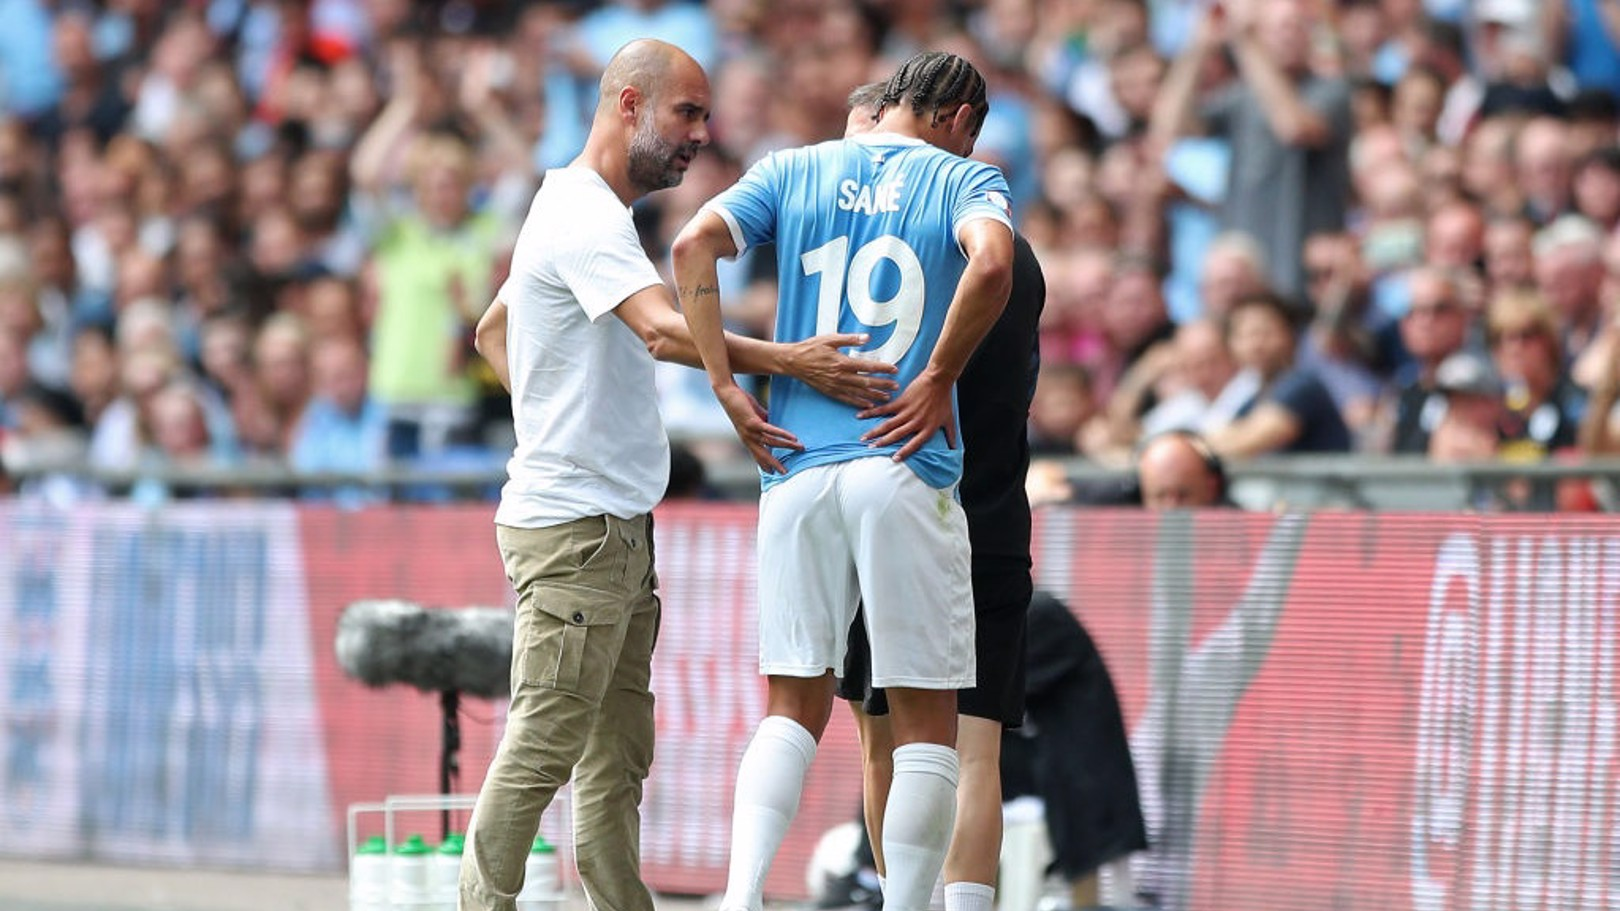 UPDATE: The latest on Sane's injury